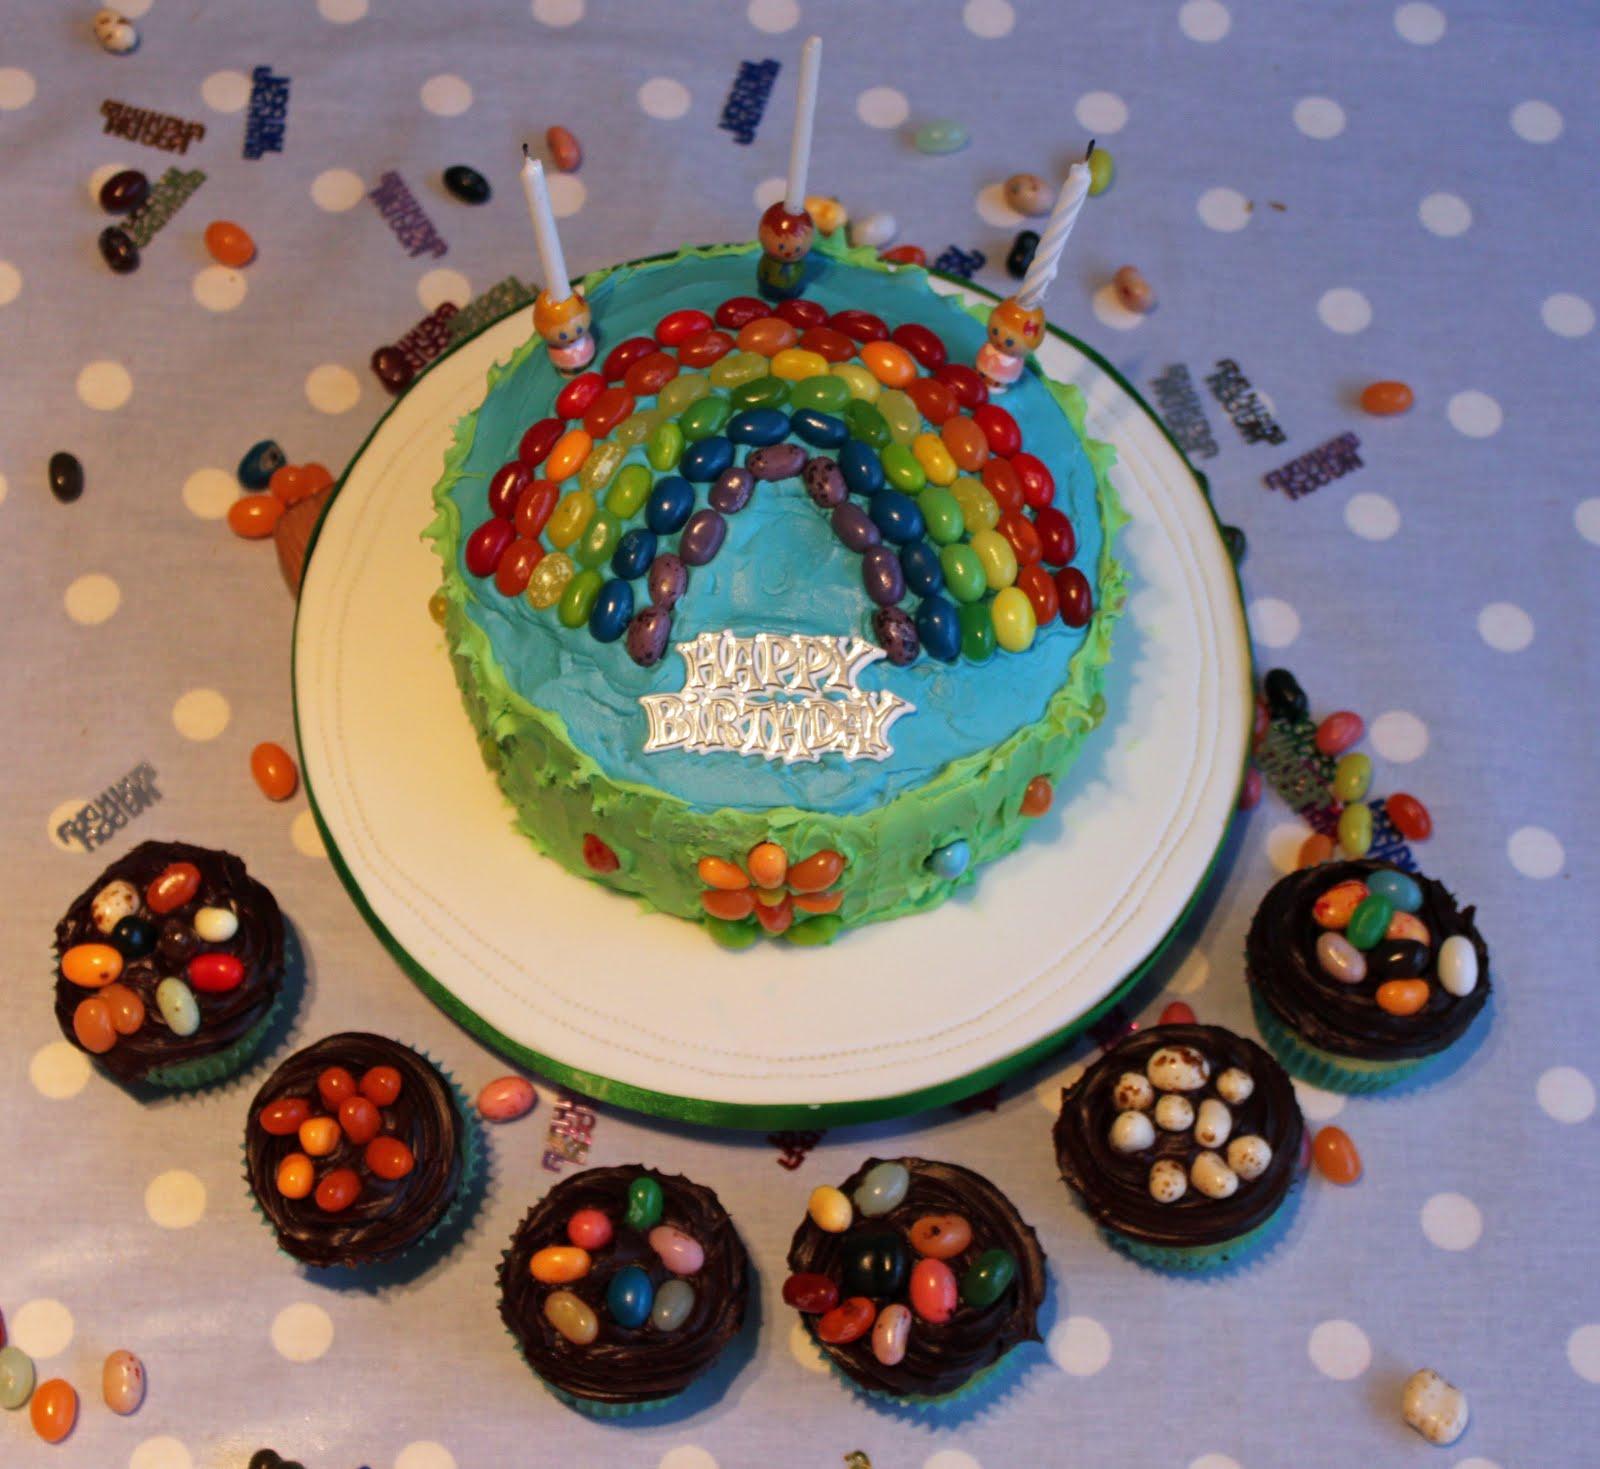 ... year I decided to make him a gluten free jelly bean birthday cake